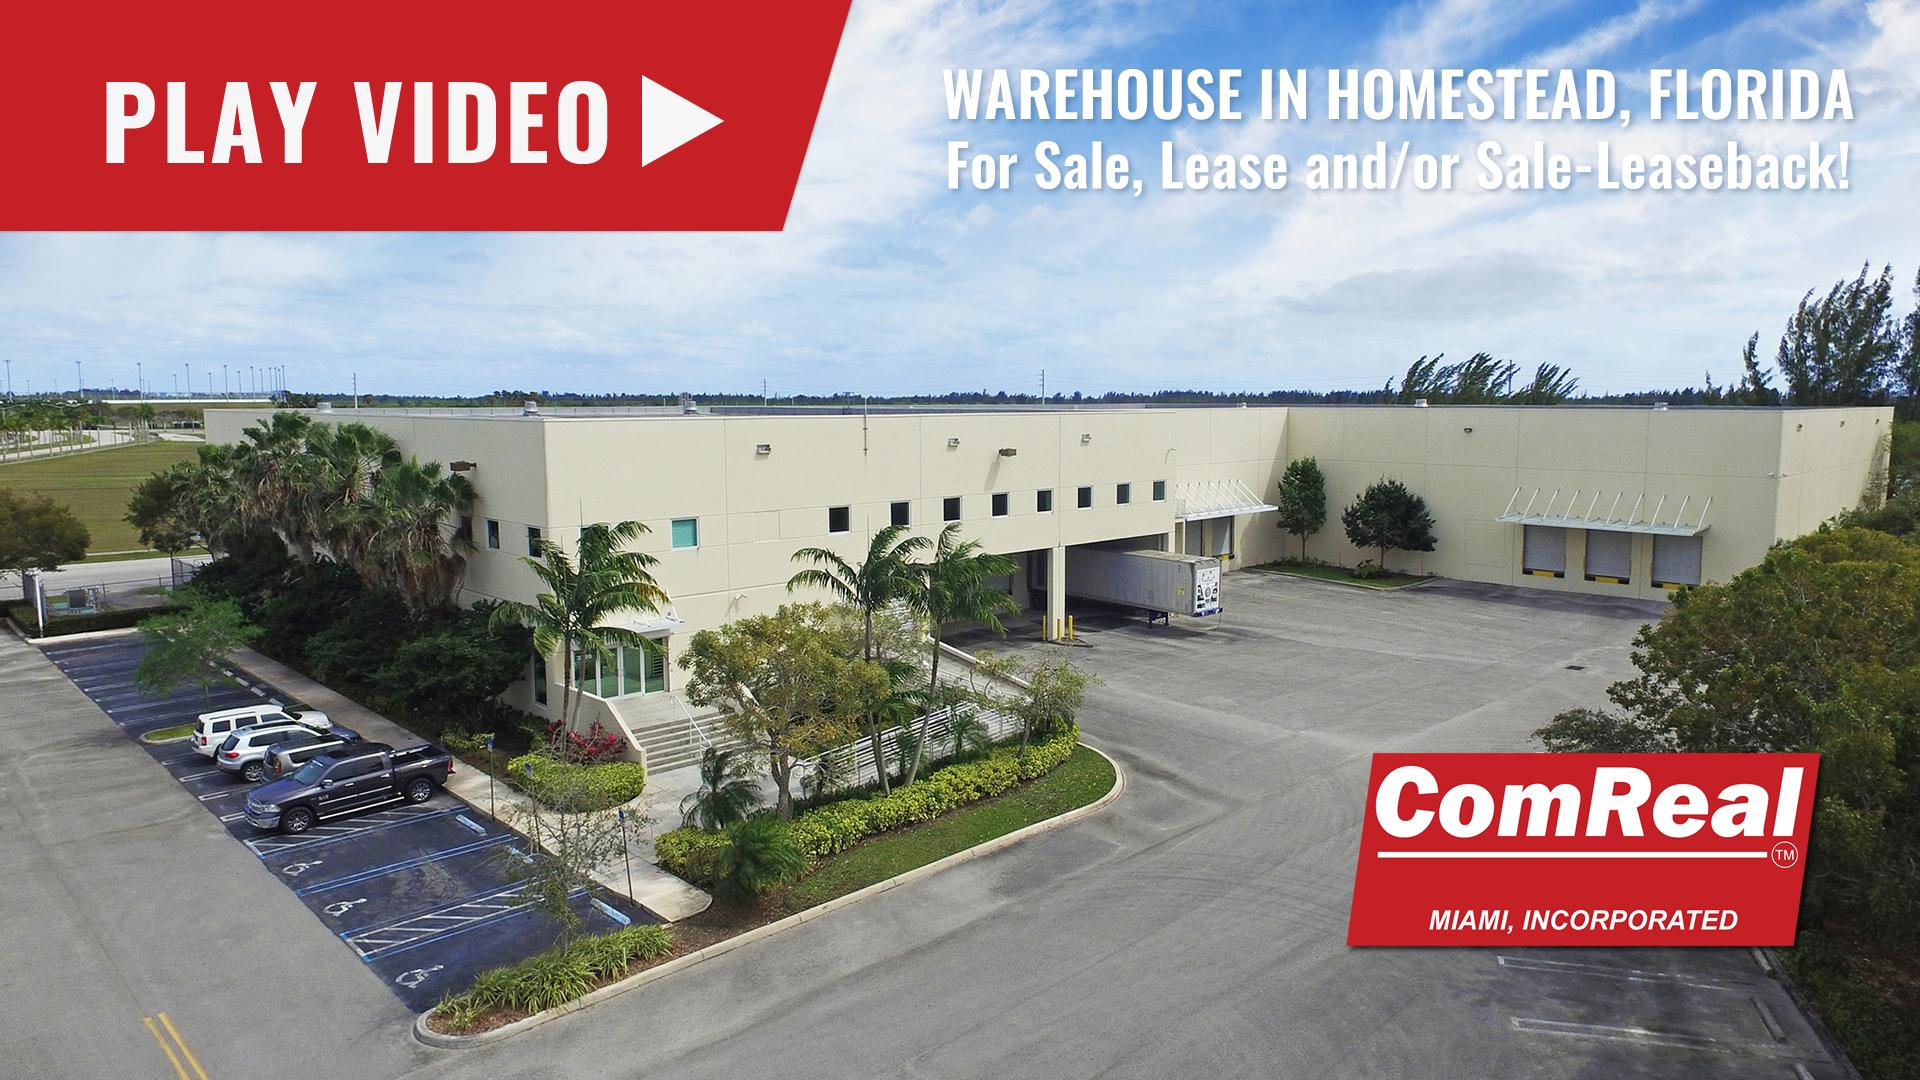 Homestead Warehouse_PLAY VIDEO